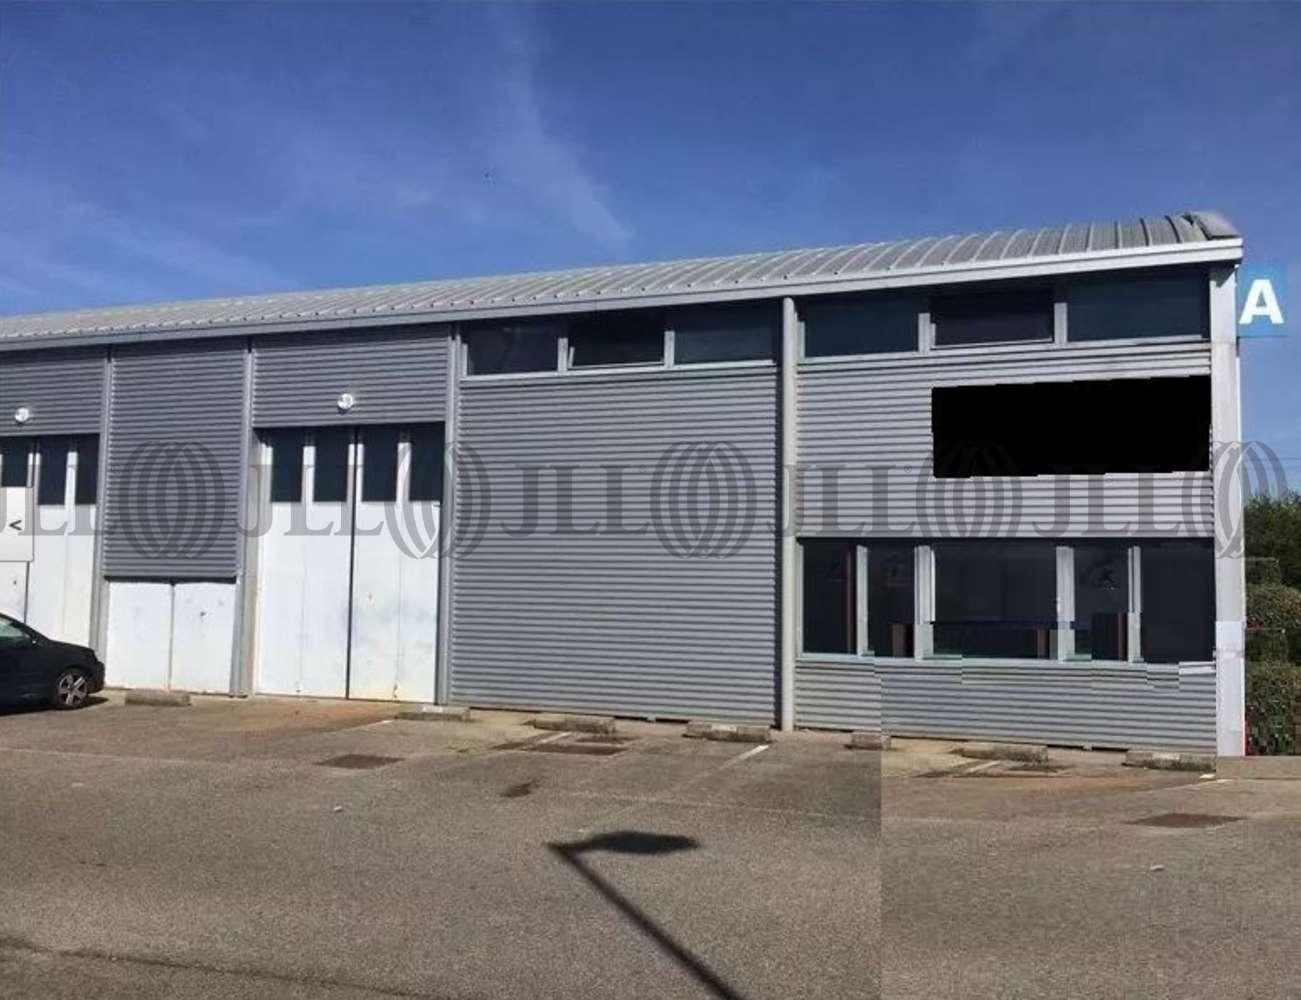 Activités/entrepôt Bron, 69500 - Achat / Location entrepot Bron - Rhône - 9618861